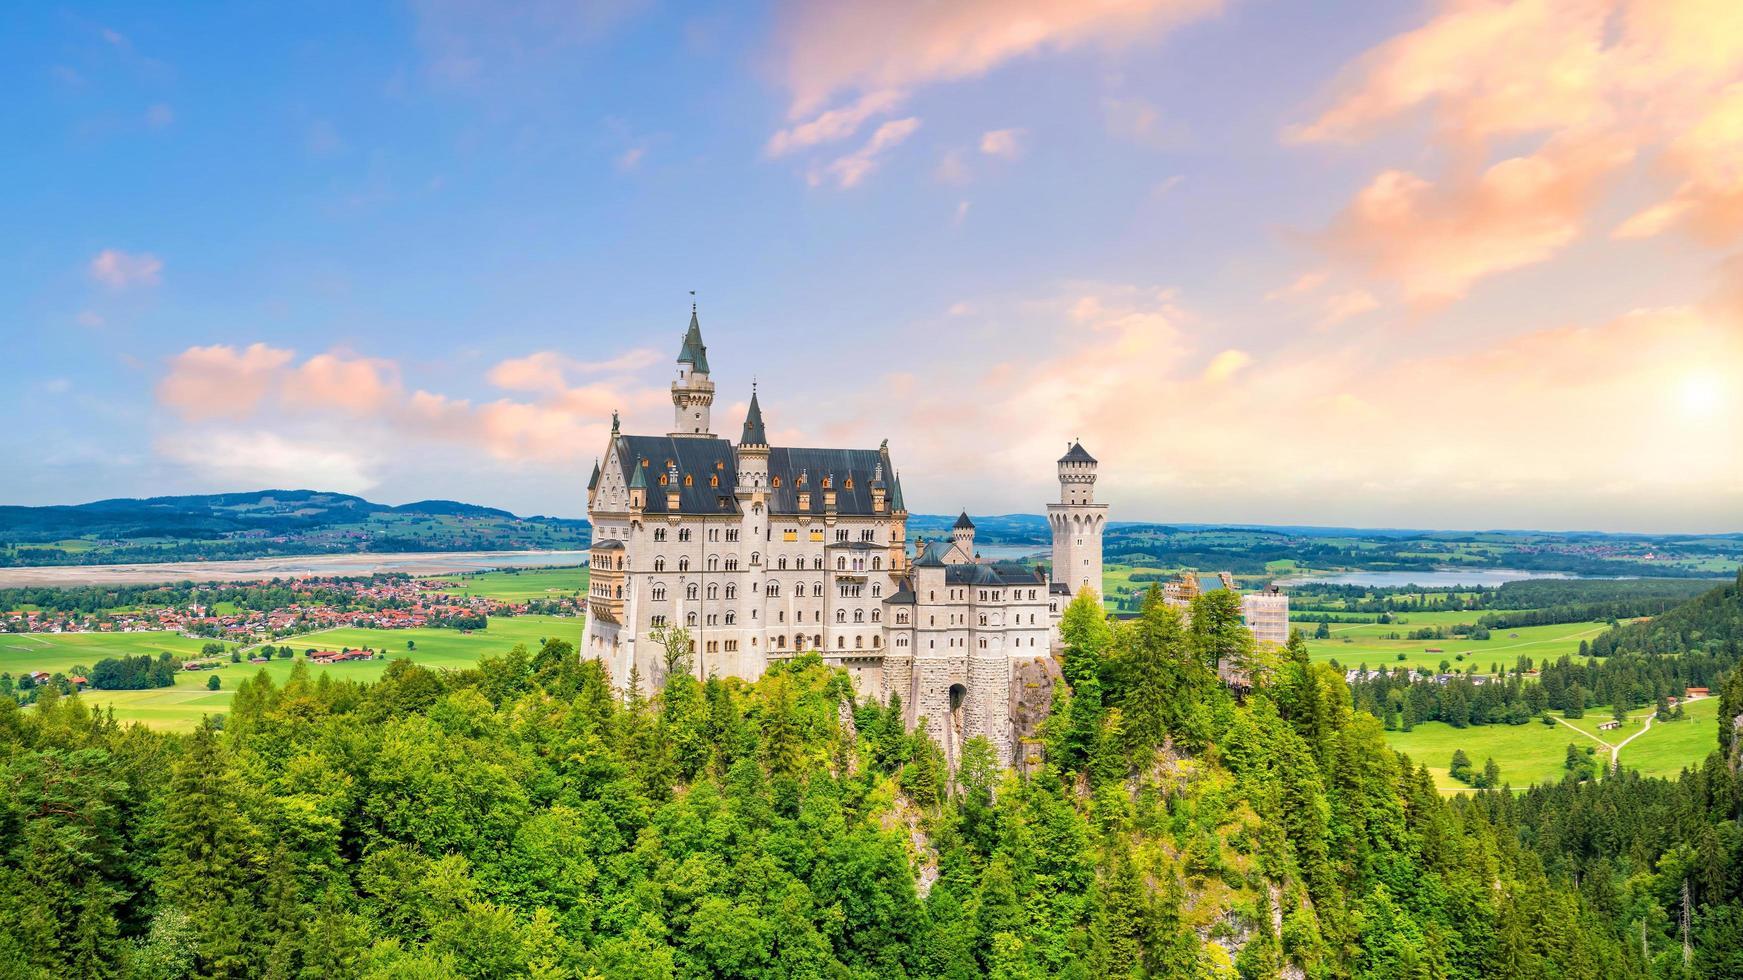 famoso castello di neuschwanstein, germania foto